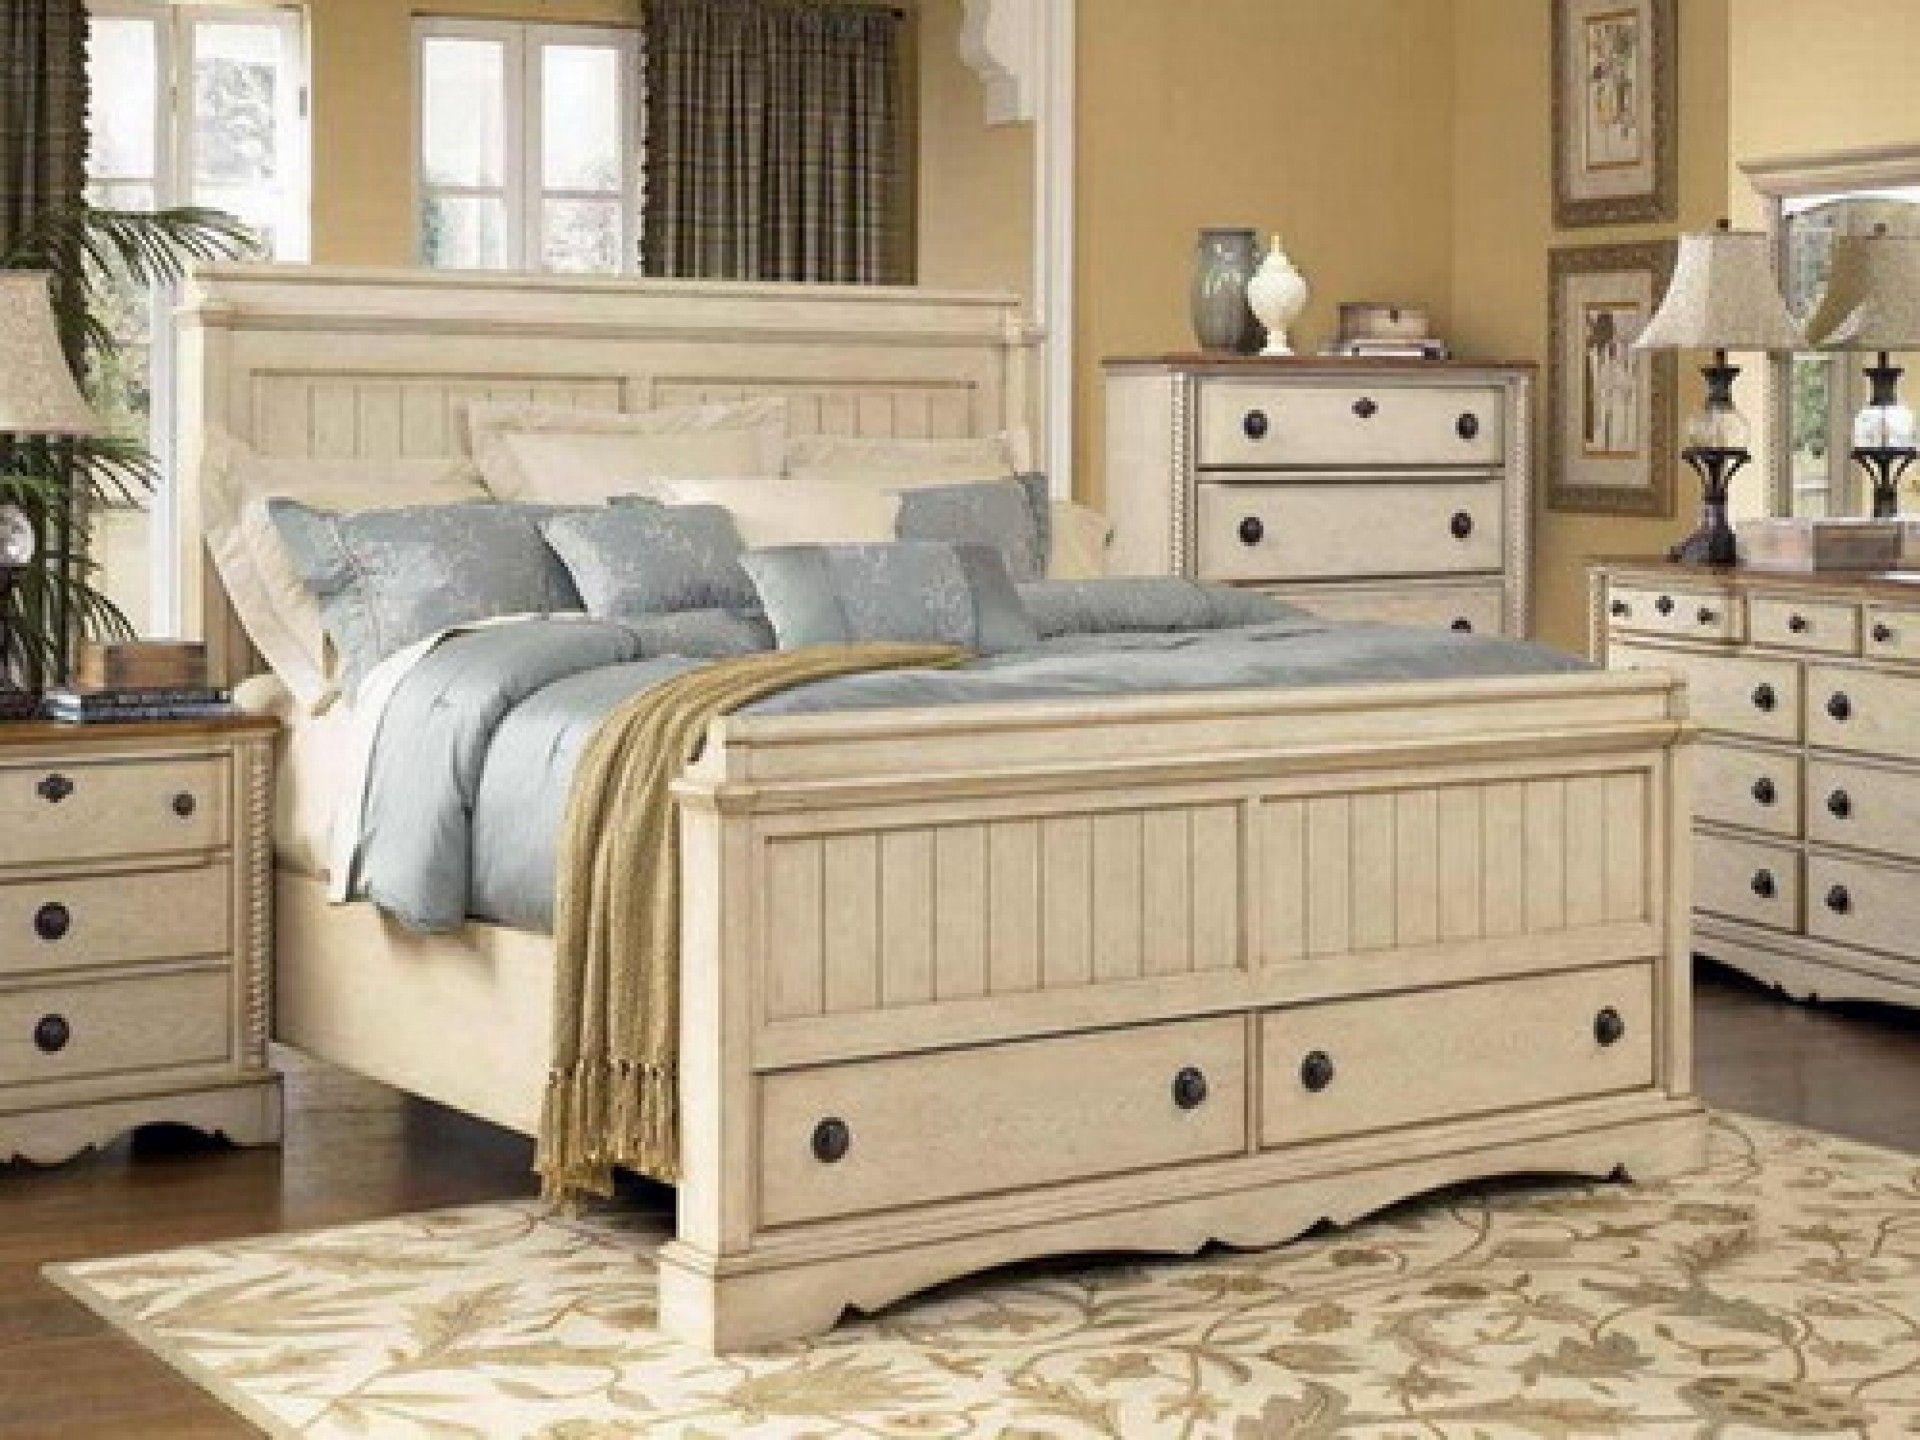 White Distressed Bedroom Furniture Sets Rustic Bedroom Furniture